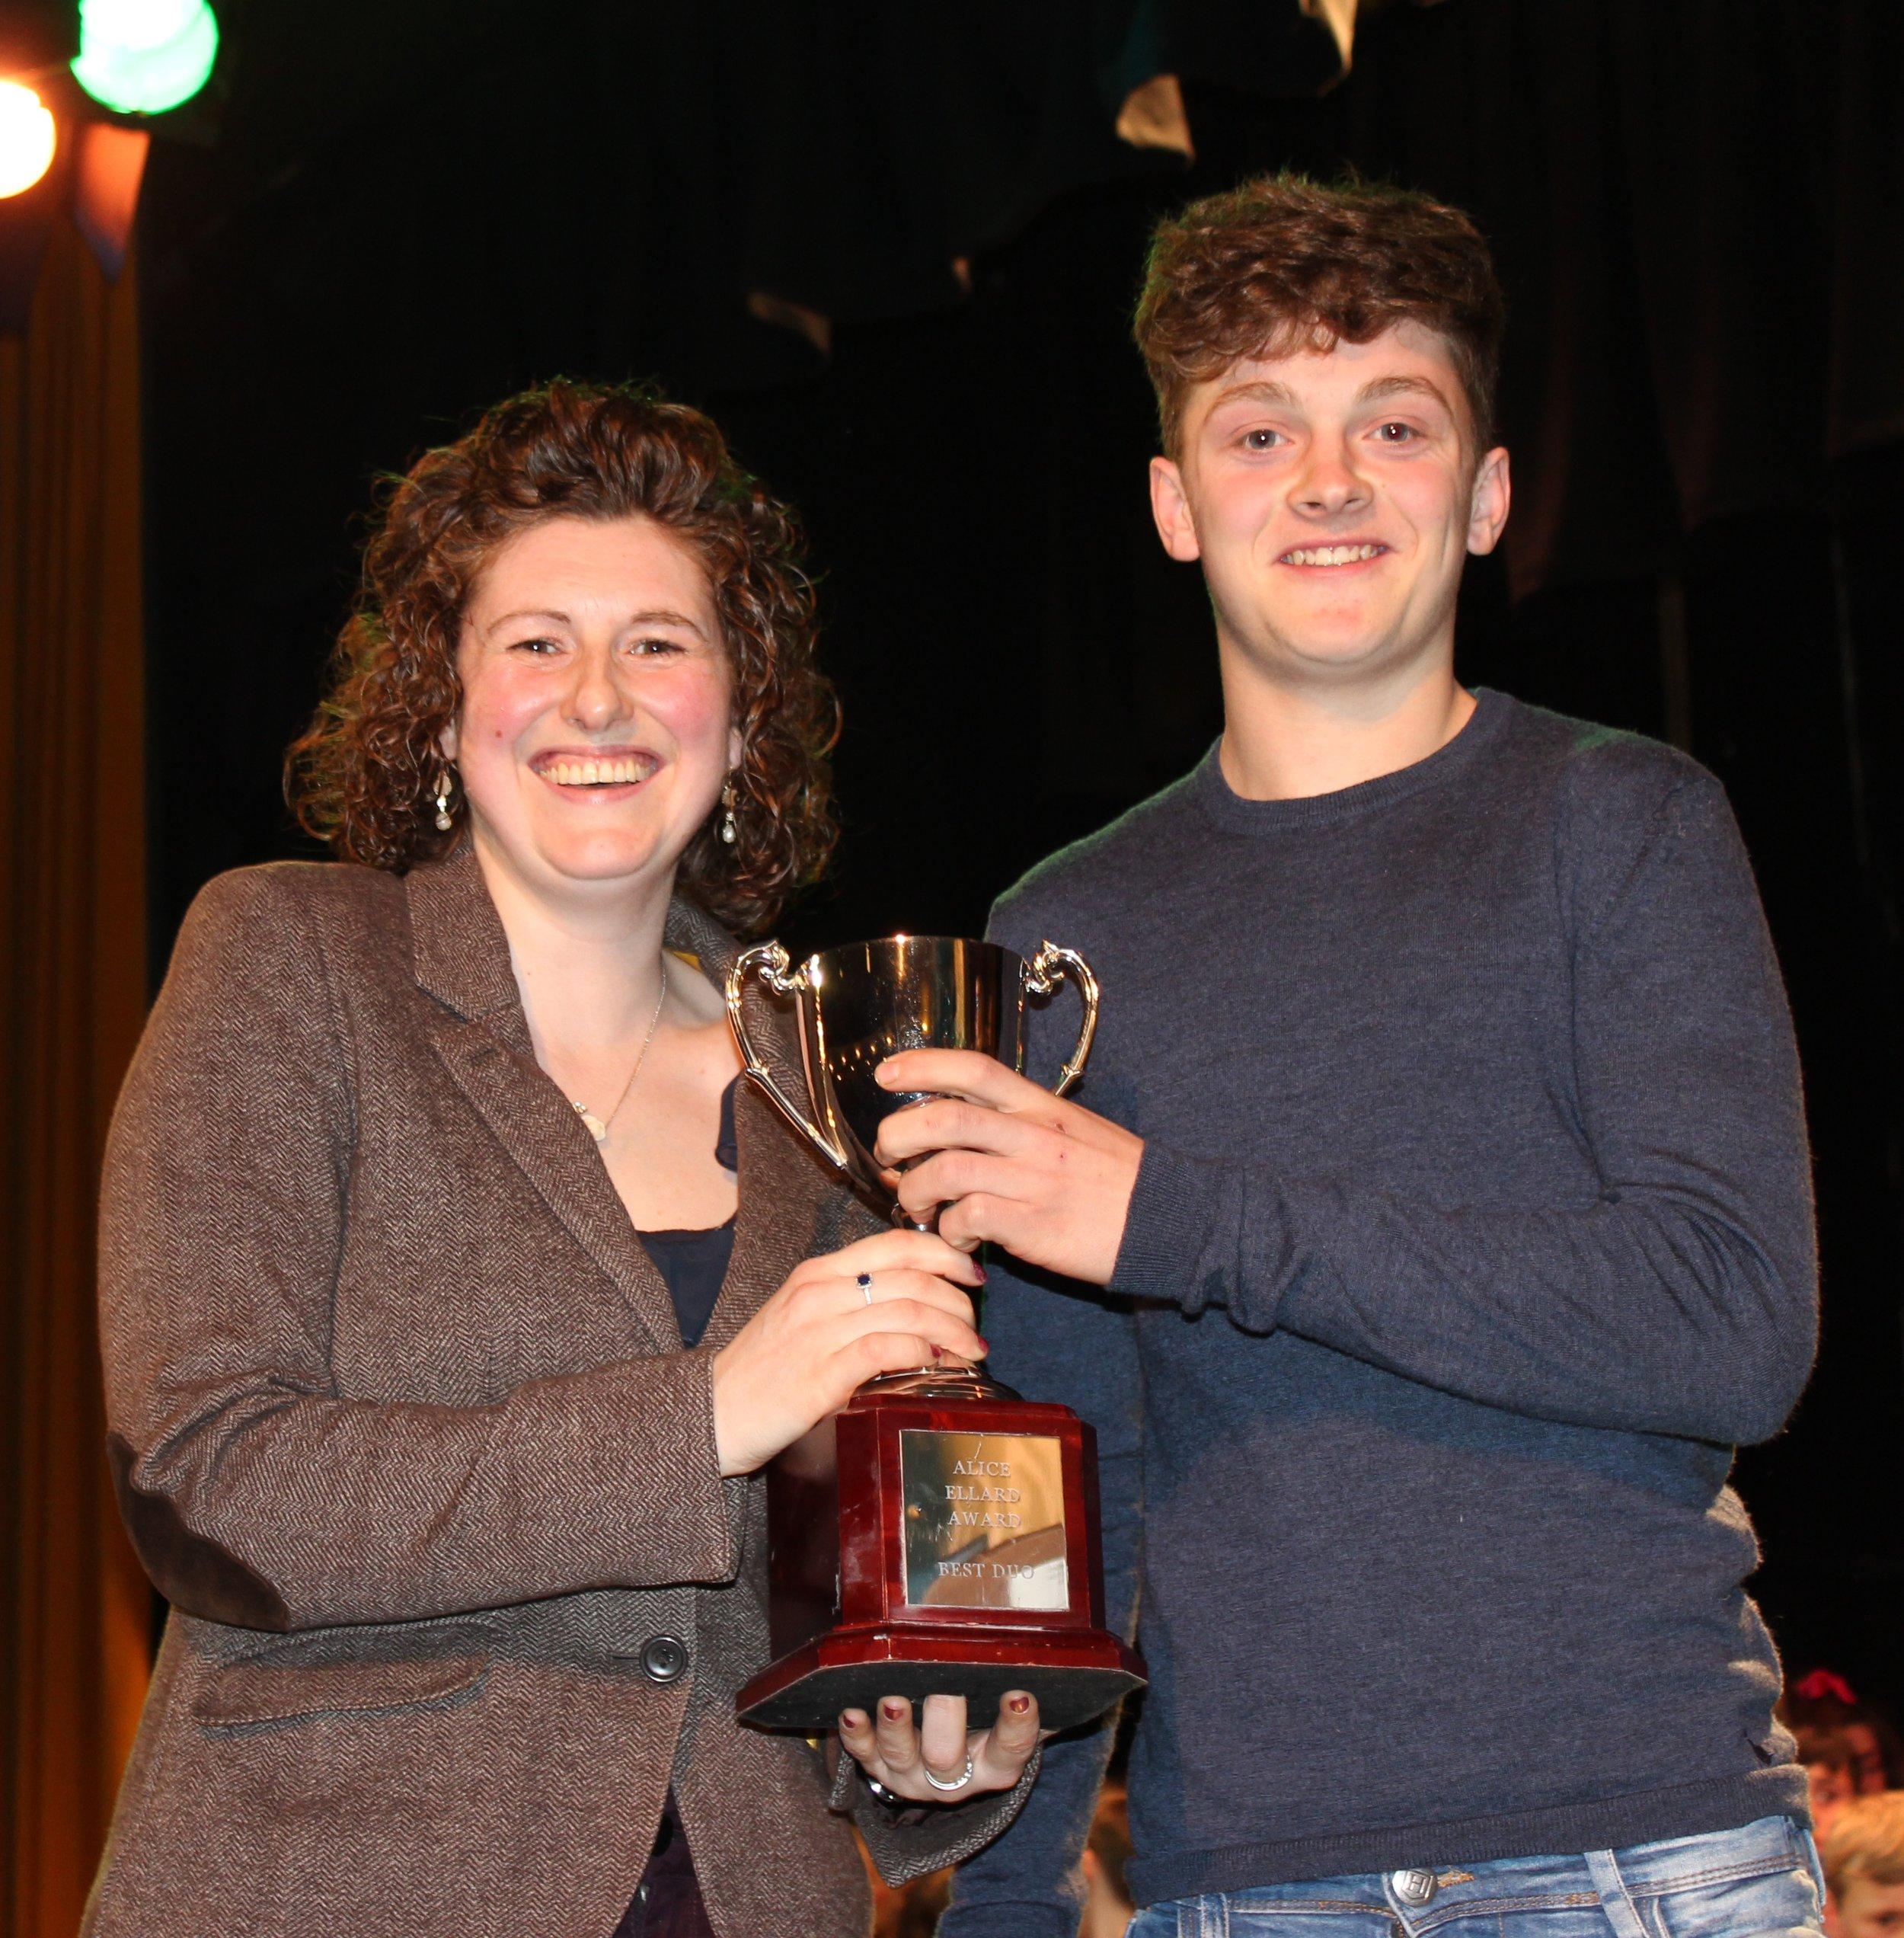 Rees Morris, Radnor Valley YFC - The Alice Ellard Award for Best Duo (with Ewan Davies)